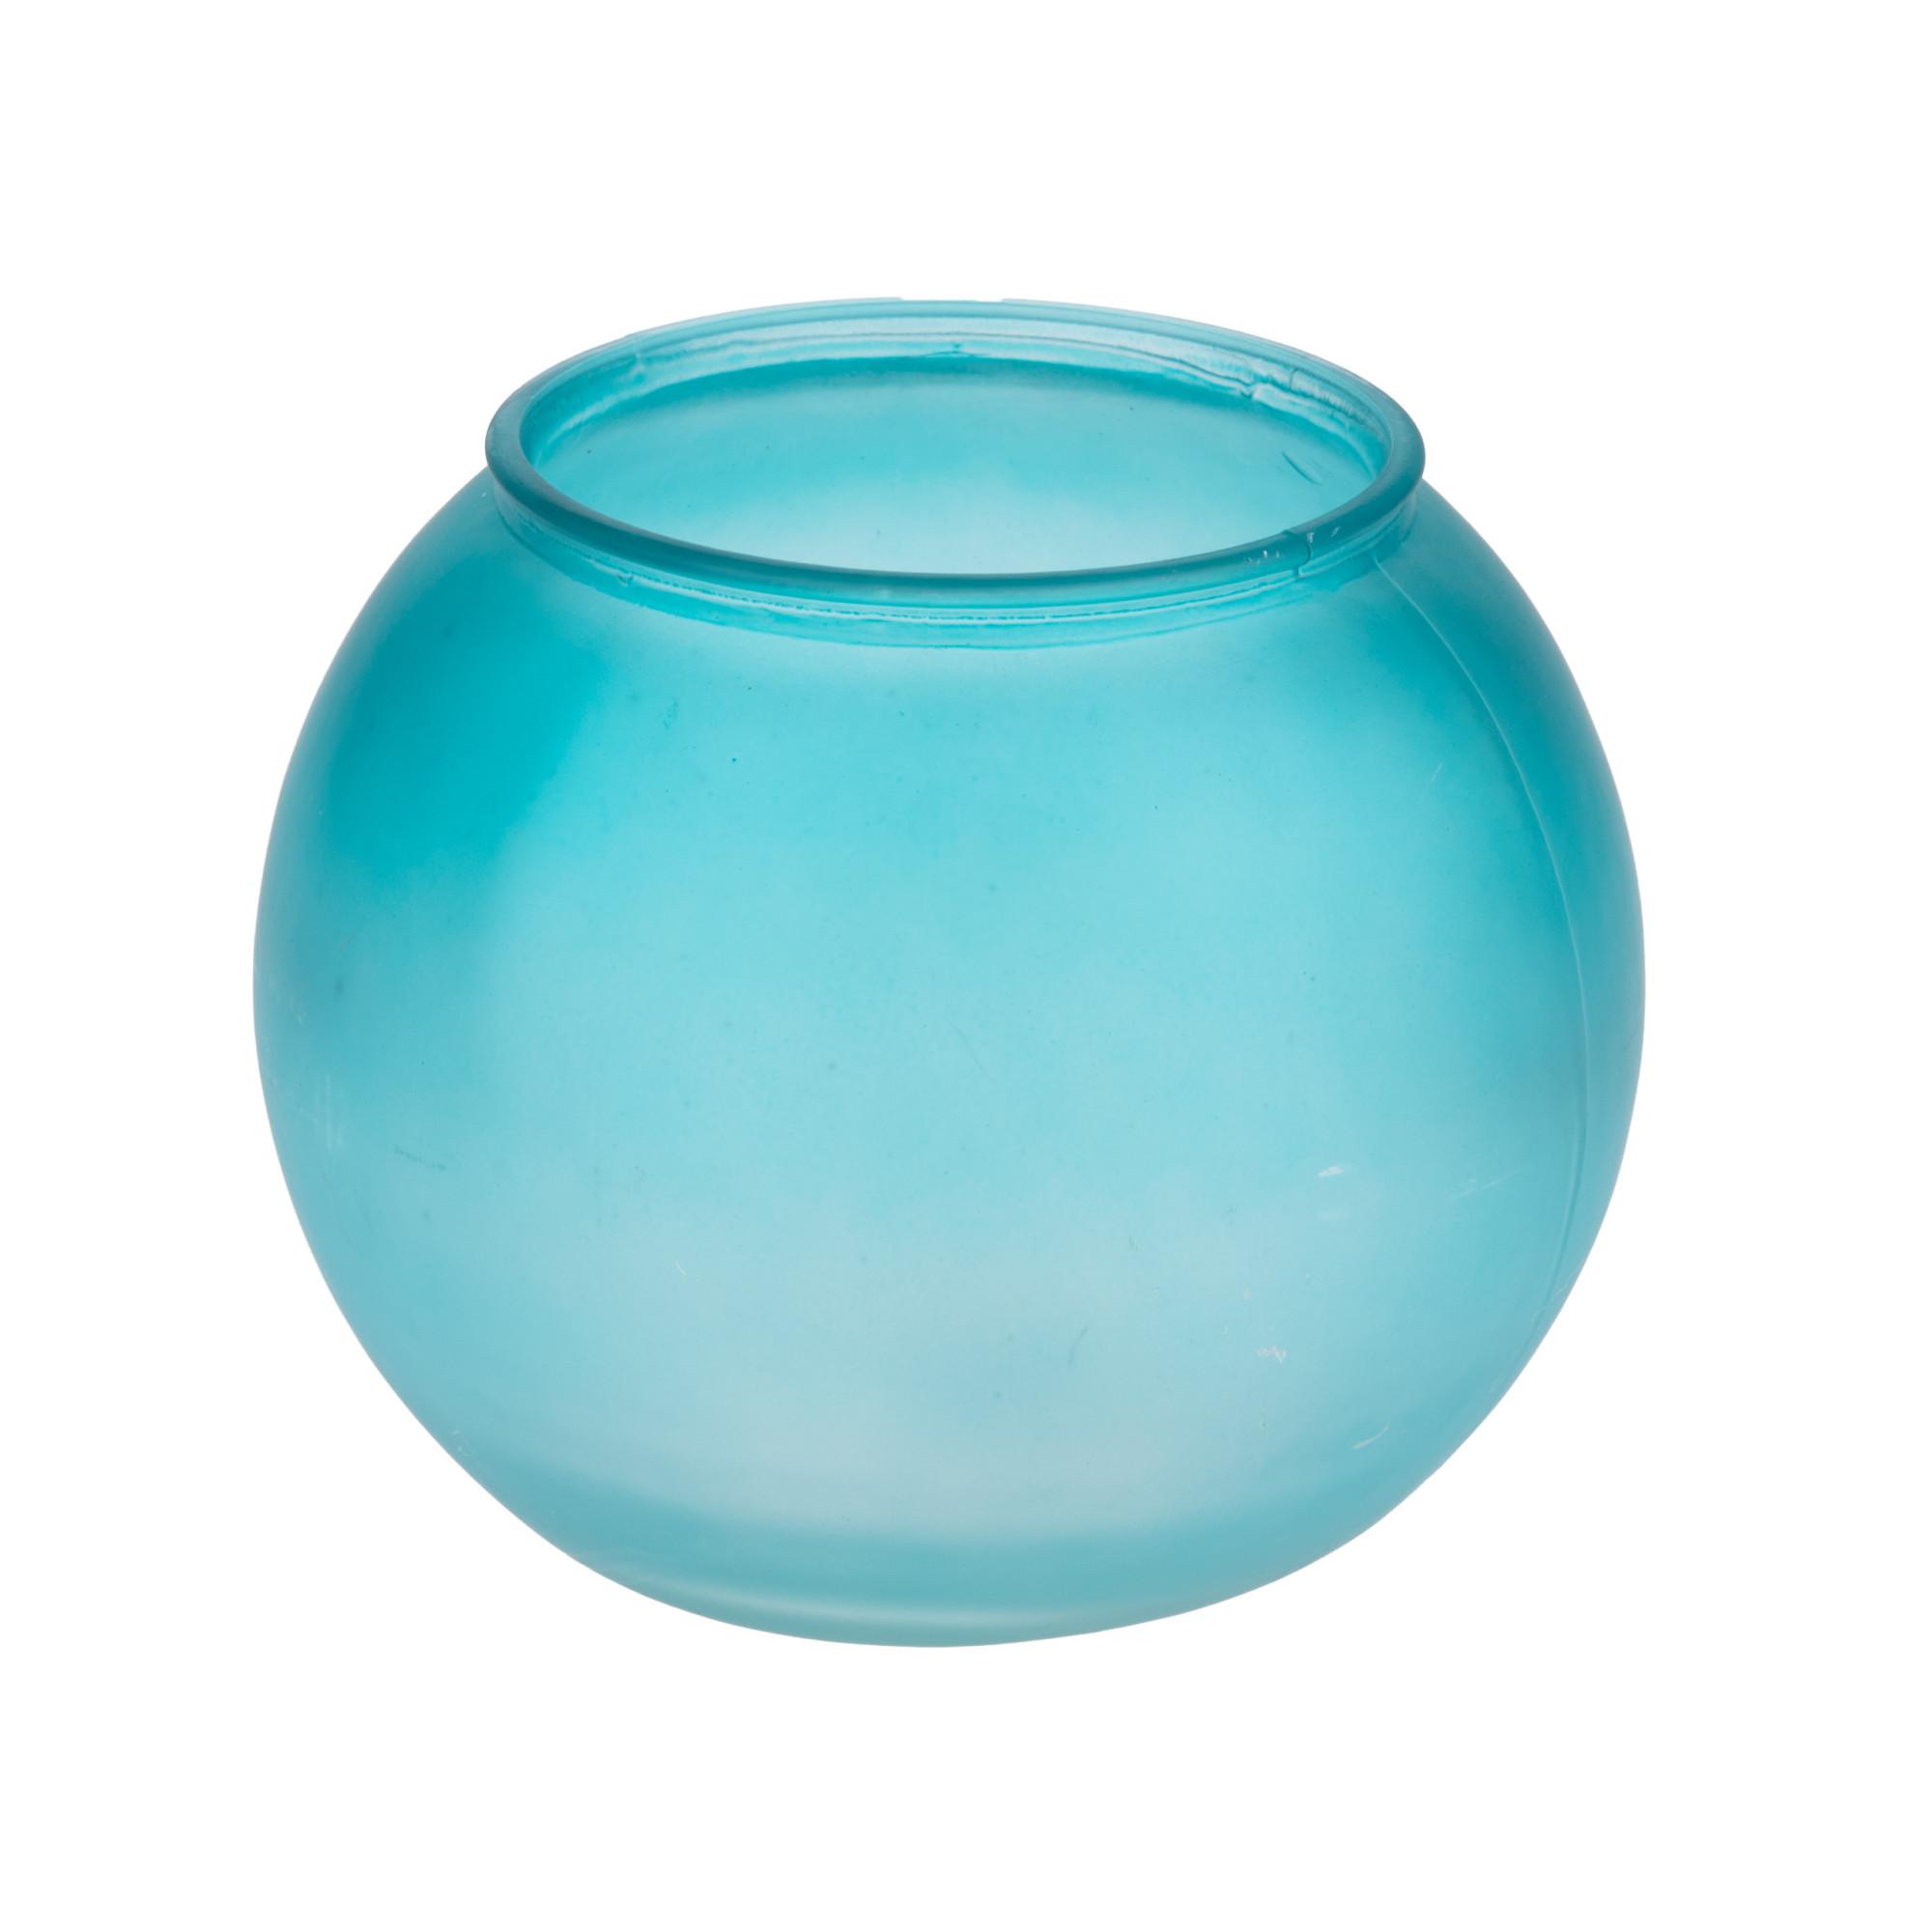 Glazen Vaas Rond Groot.64lvl Glas Vaas Rond Bol Blauw Groot Colored Glass Glassware